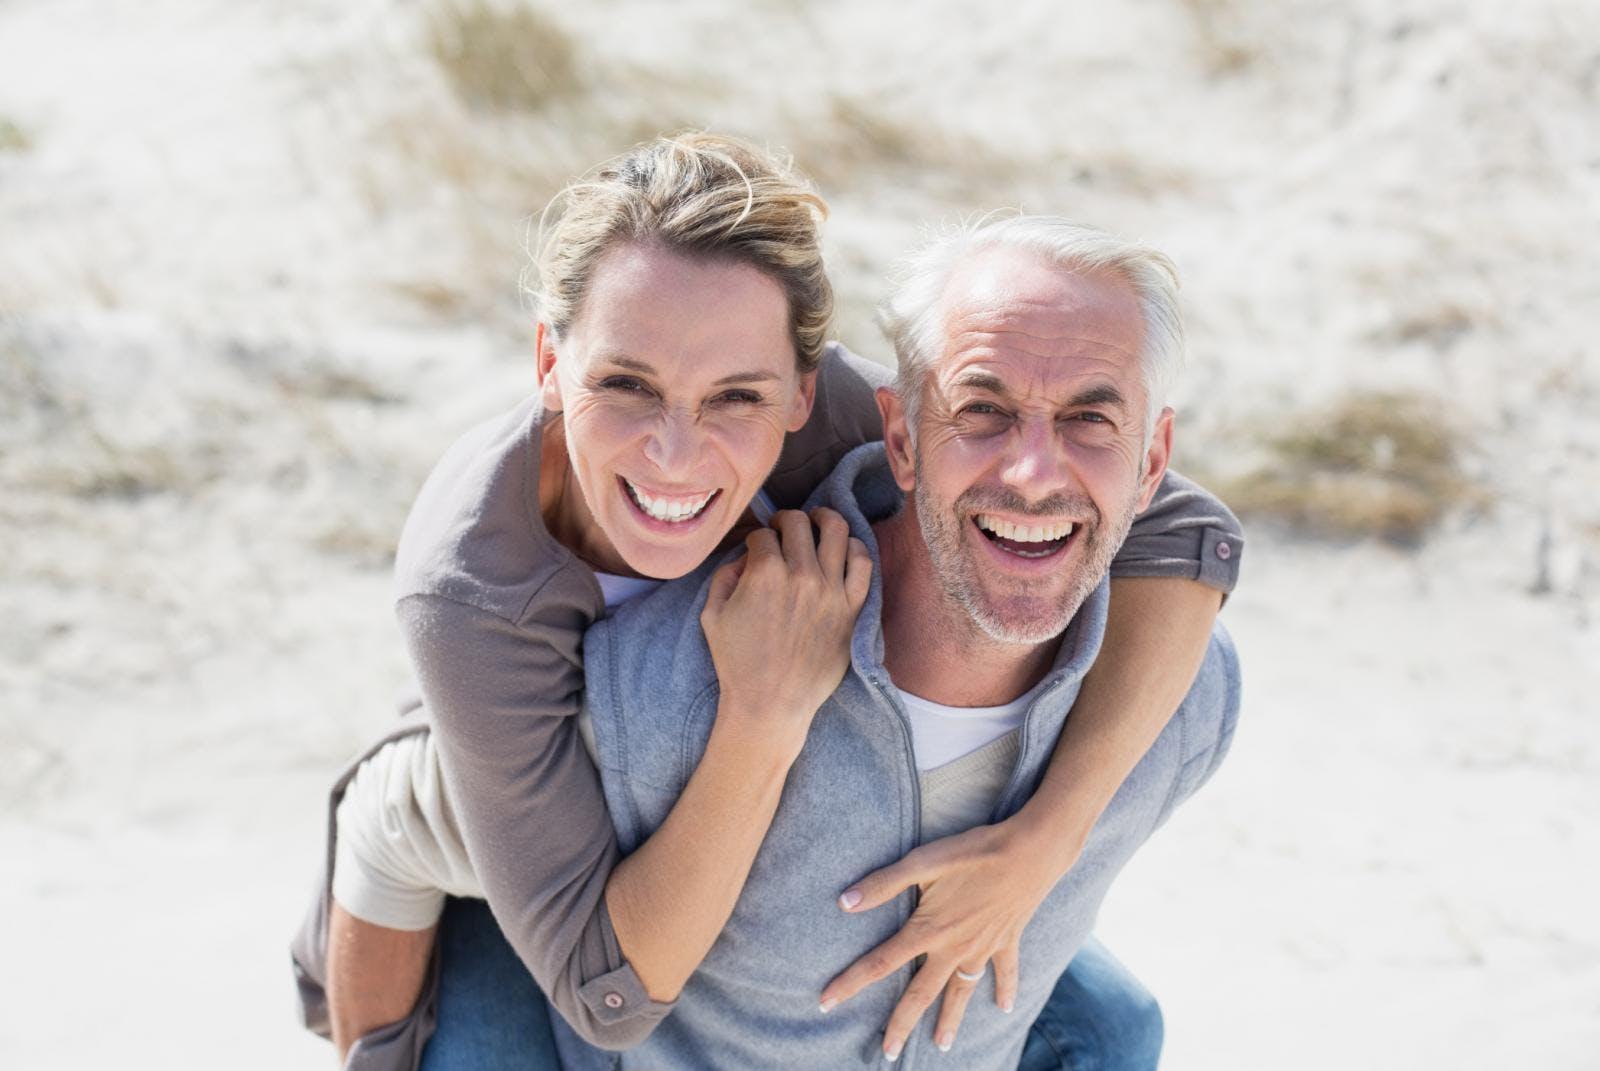 Elderly man giving a woman a piggyback ride on the beach.